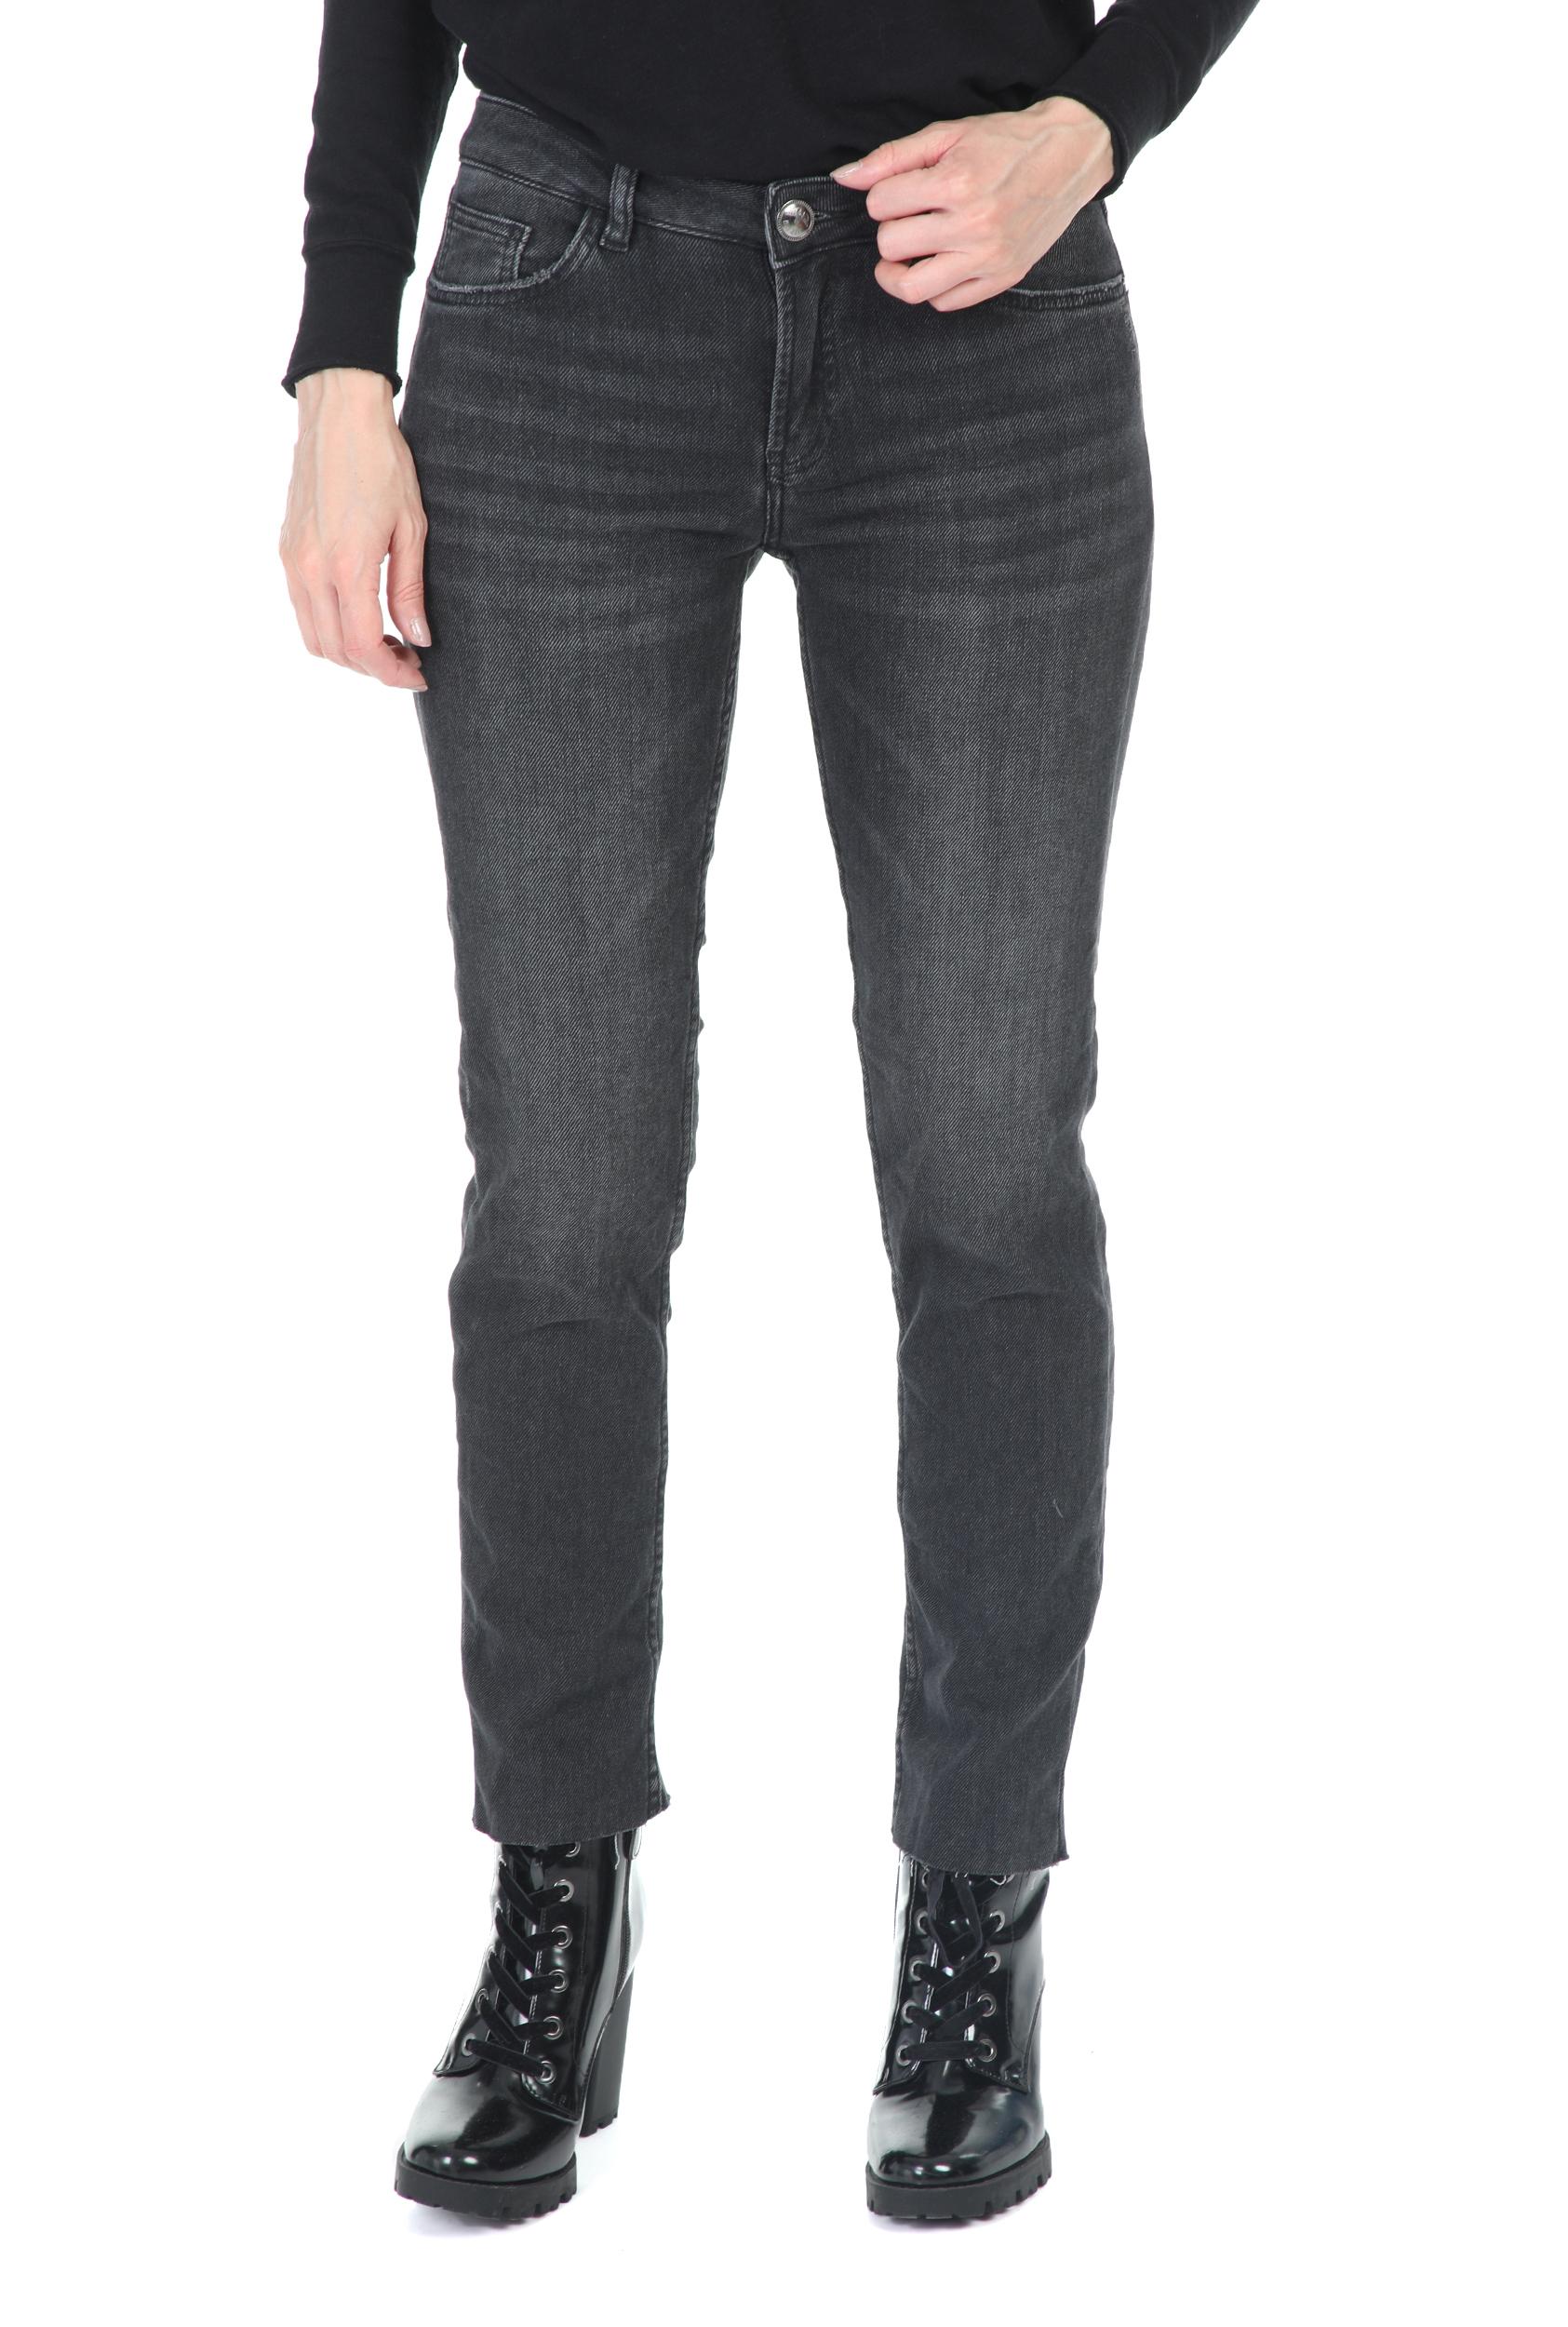 MOS MOSH - Γυναικείο παντελόνι τζιν MOS MOSH Ava Jeans γκρί-ανθρακί